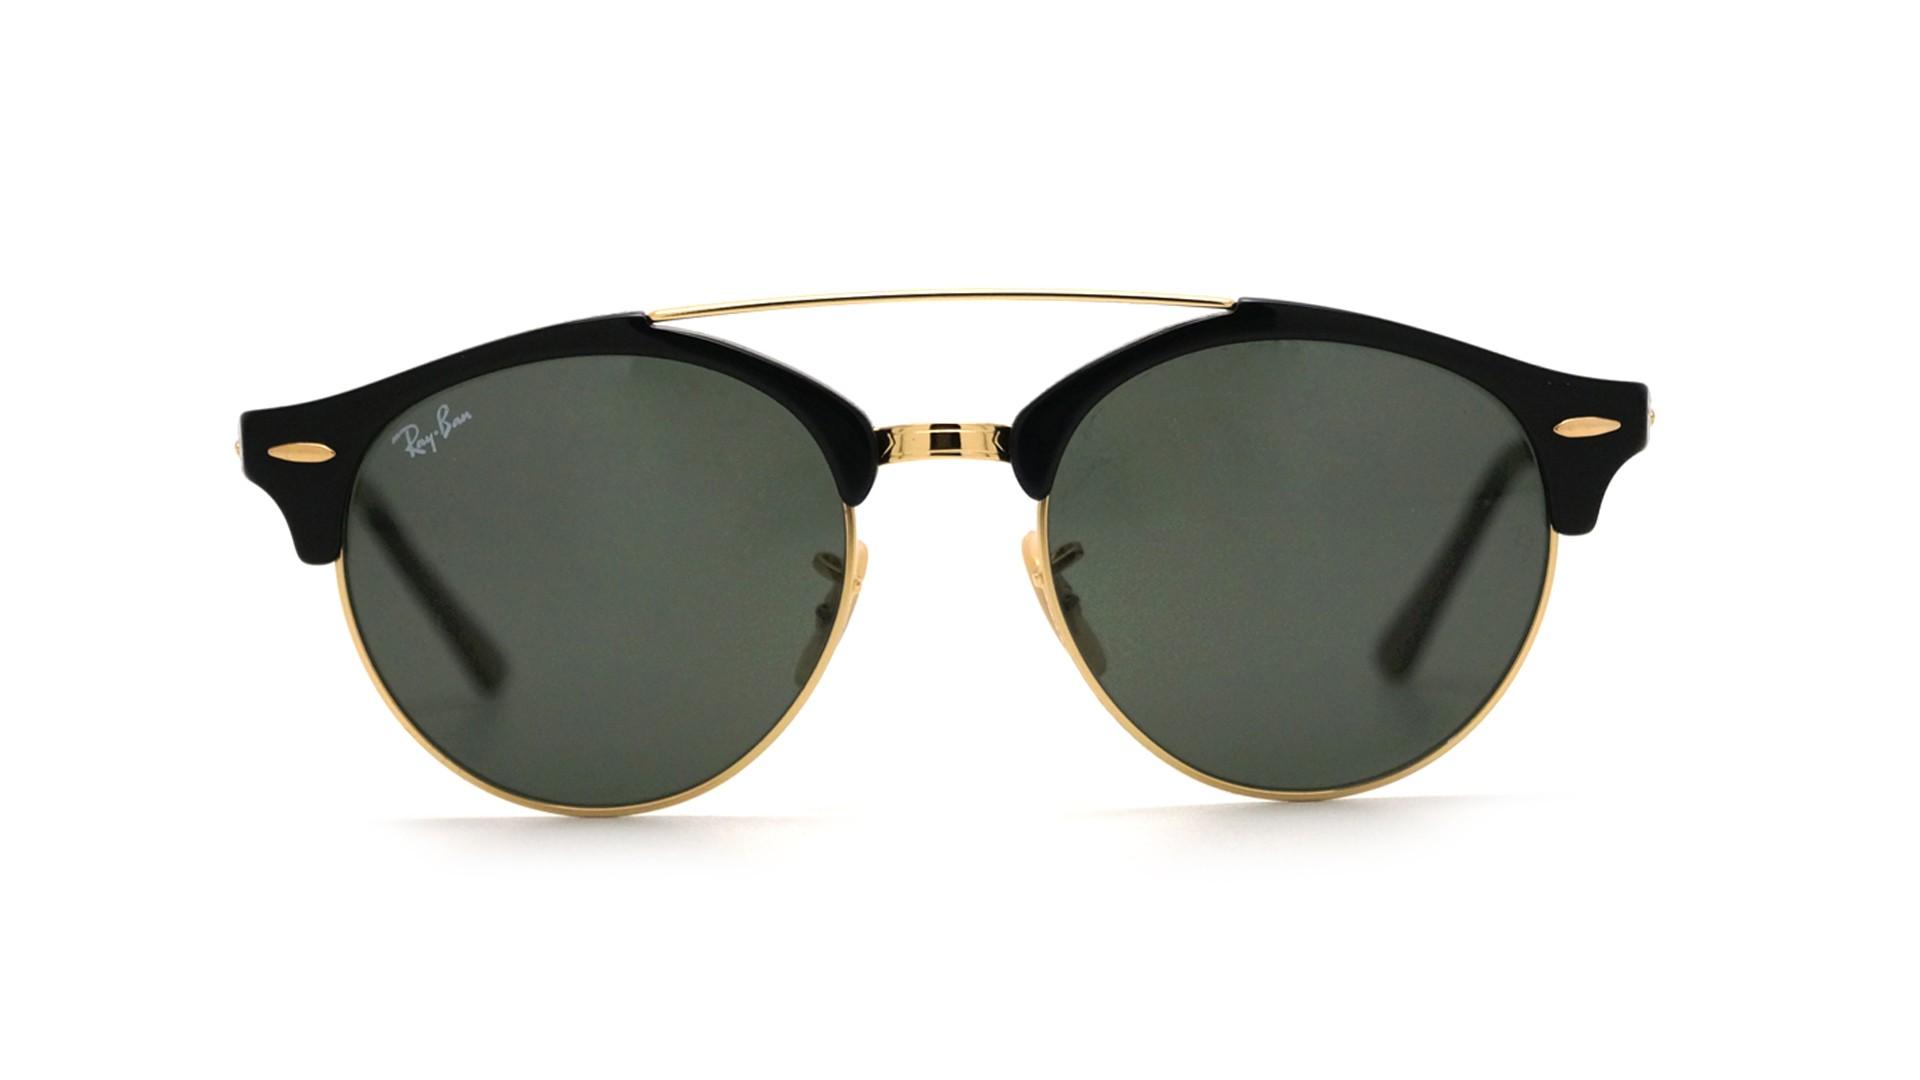 c3d1d57b5d Sunglasses Ray-Ban Clubround double bridge Black RB4346 901 51-19 Medium